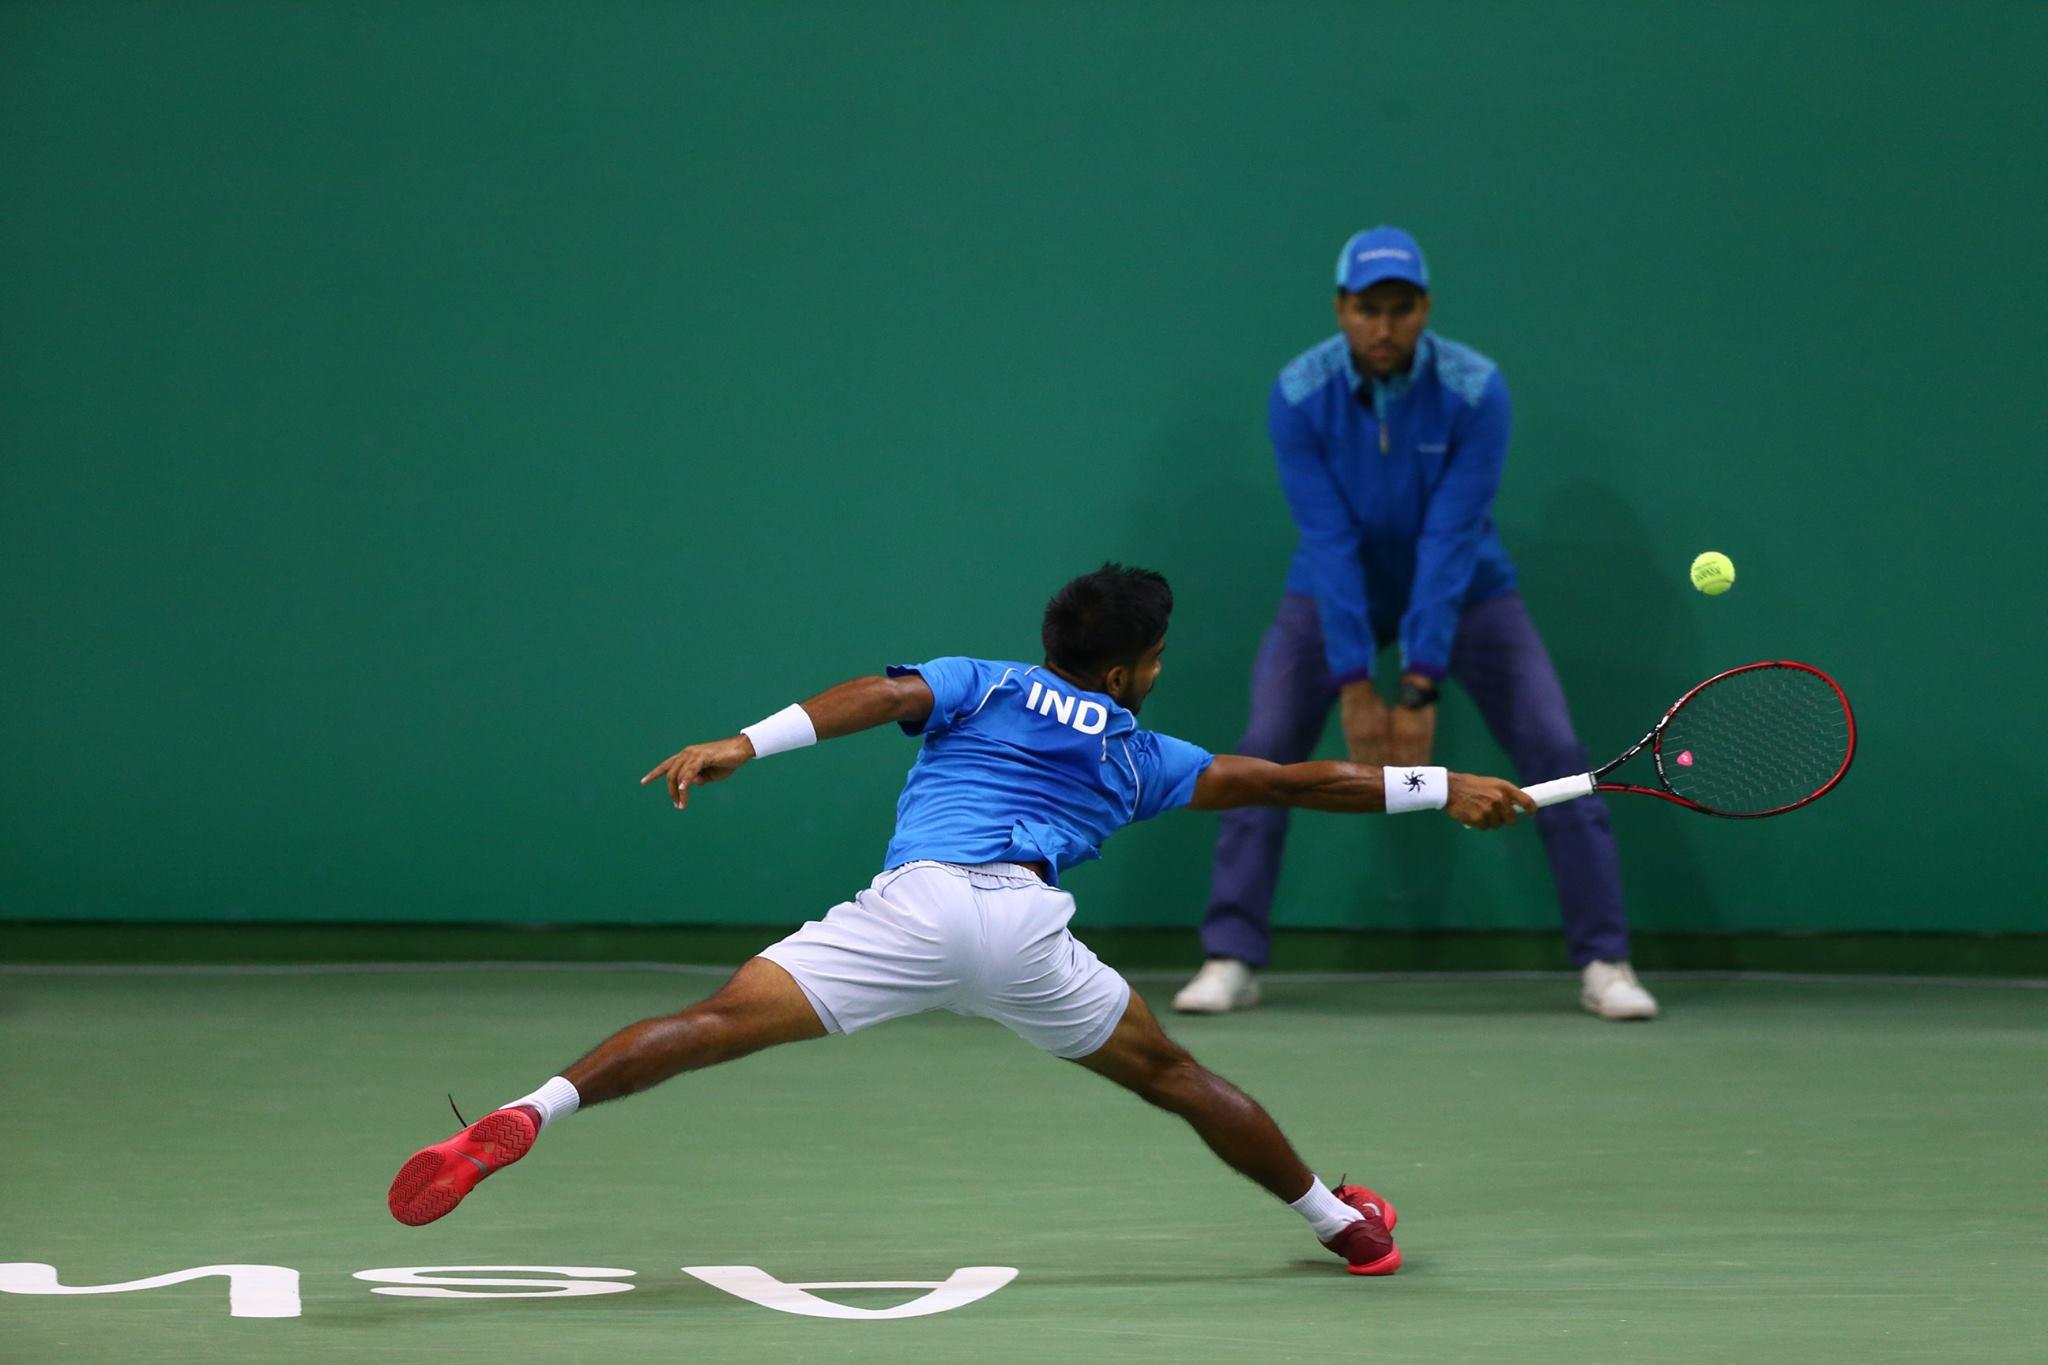 India's Sumit Nagal won his men's singles quarter-final in indoor tennis ©Ashgabat 2017/Facebook